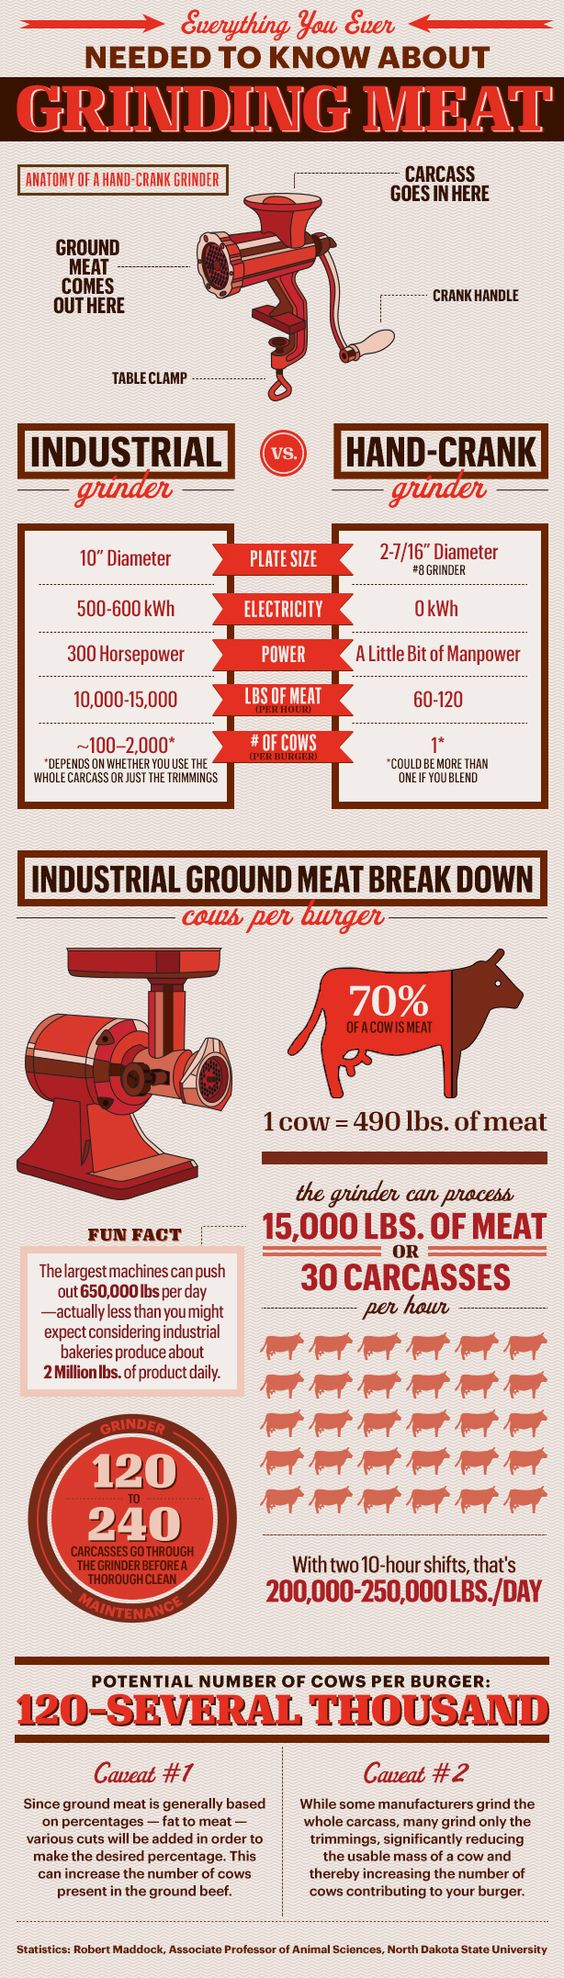 Meat Grinder Statistics - Why You Should Buy a Meat Grinder - Esquire